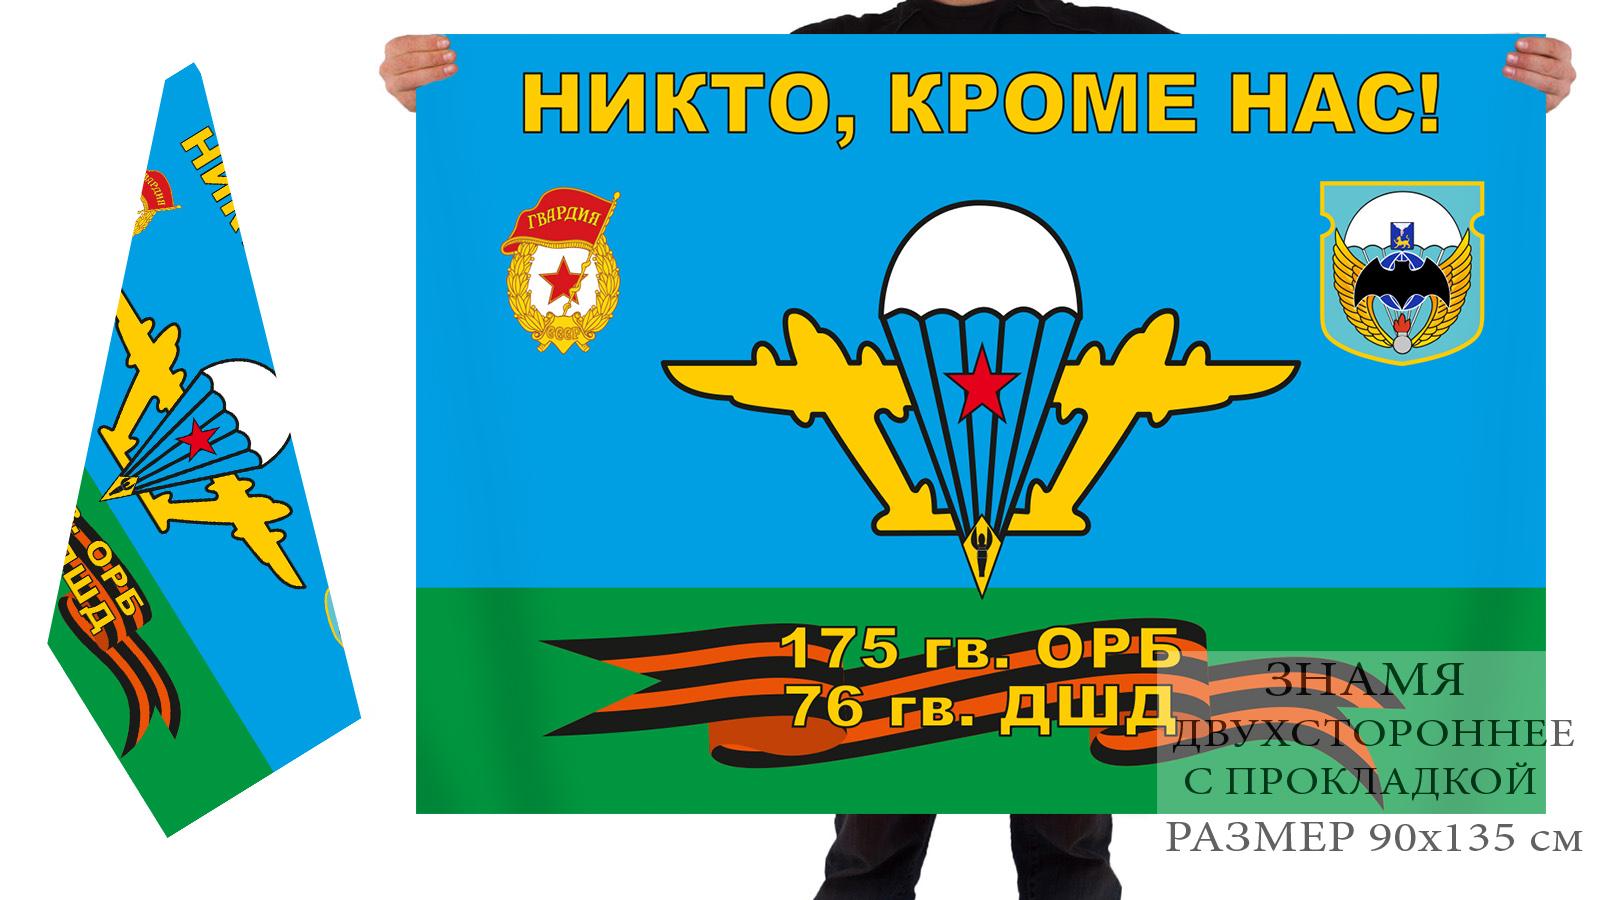 Двусторонний флаг 175 гвардейского ОРБ 76 гвардейской ДШД